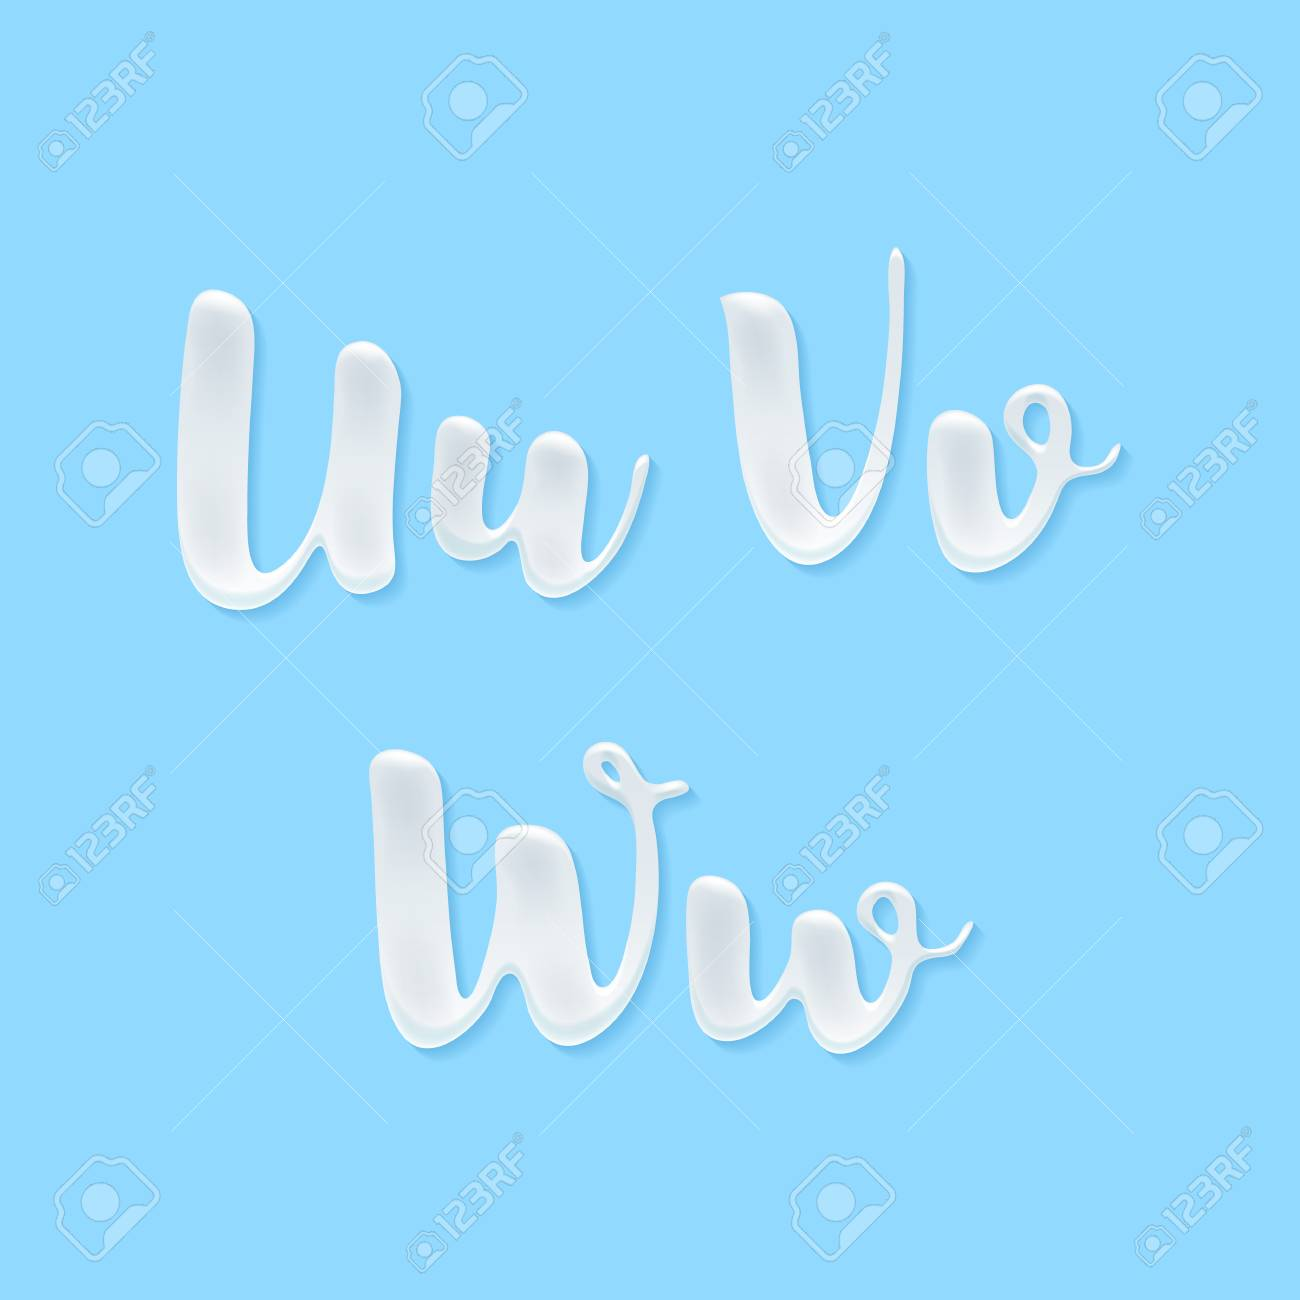 Milk, yogurt or cream abc letters set. White smudges splashes alphabet on blue background vector illustration. Good for poster banner advertising packaging design. - 59873174